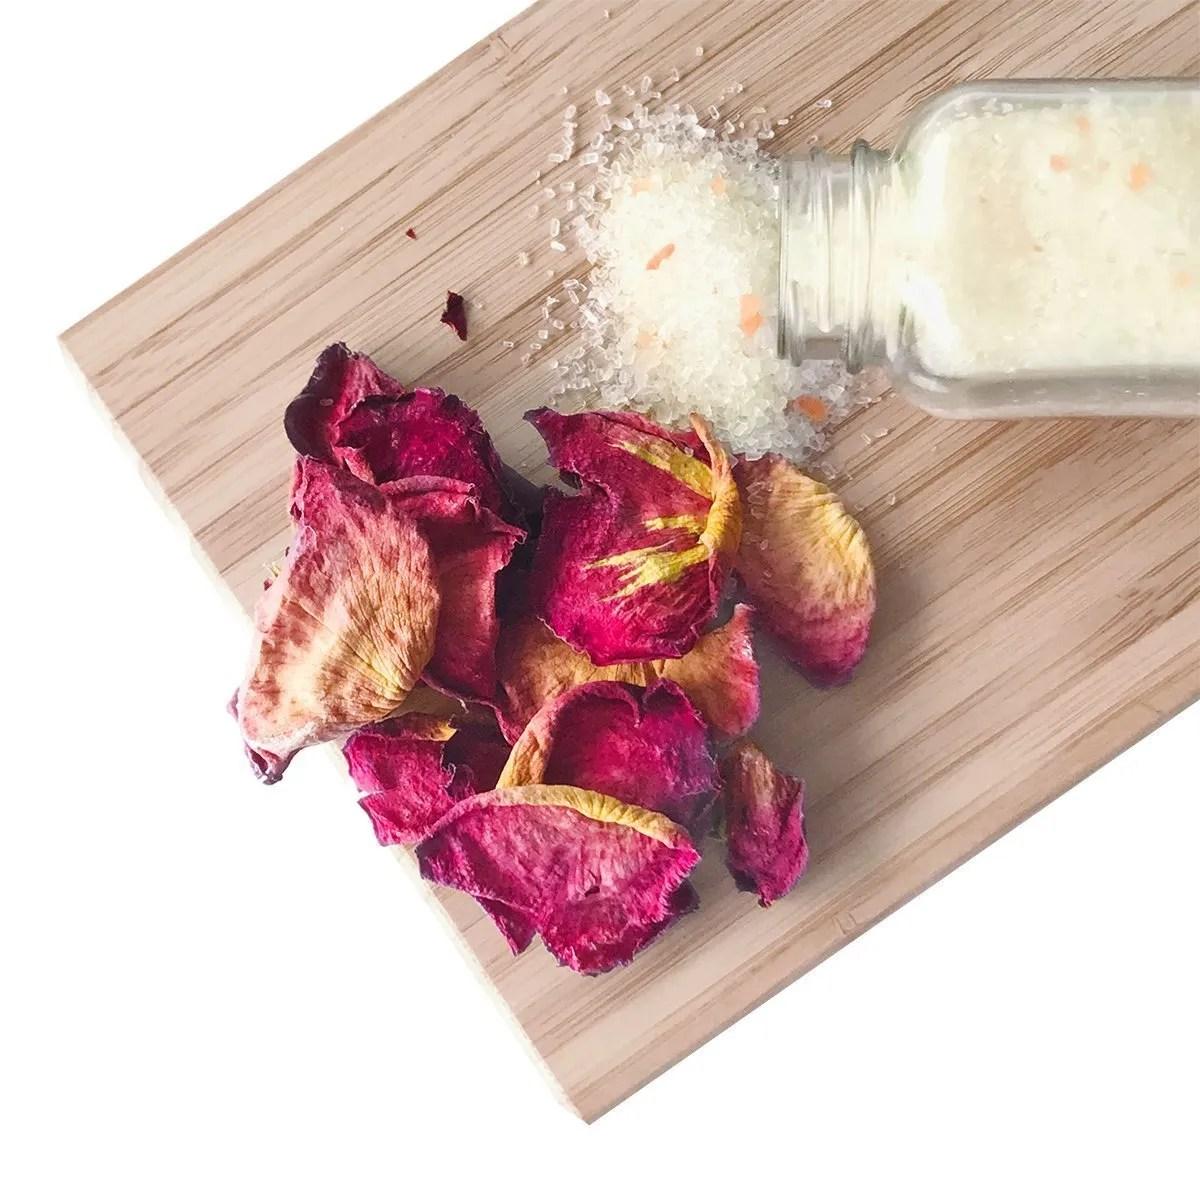 rose bath salts